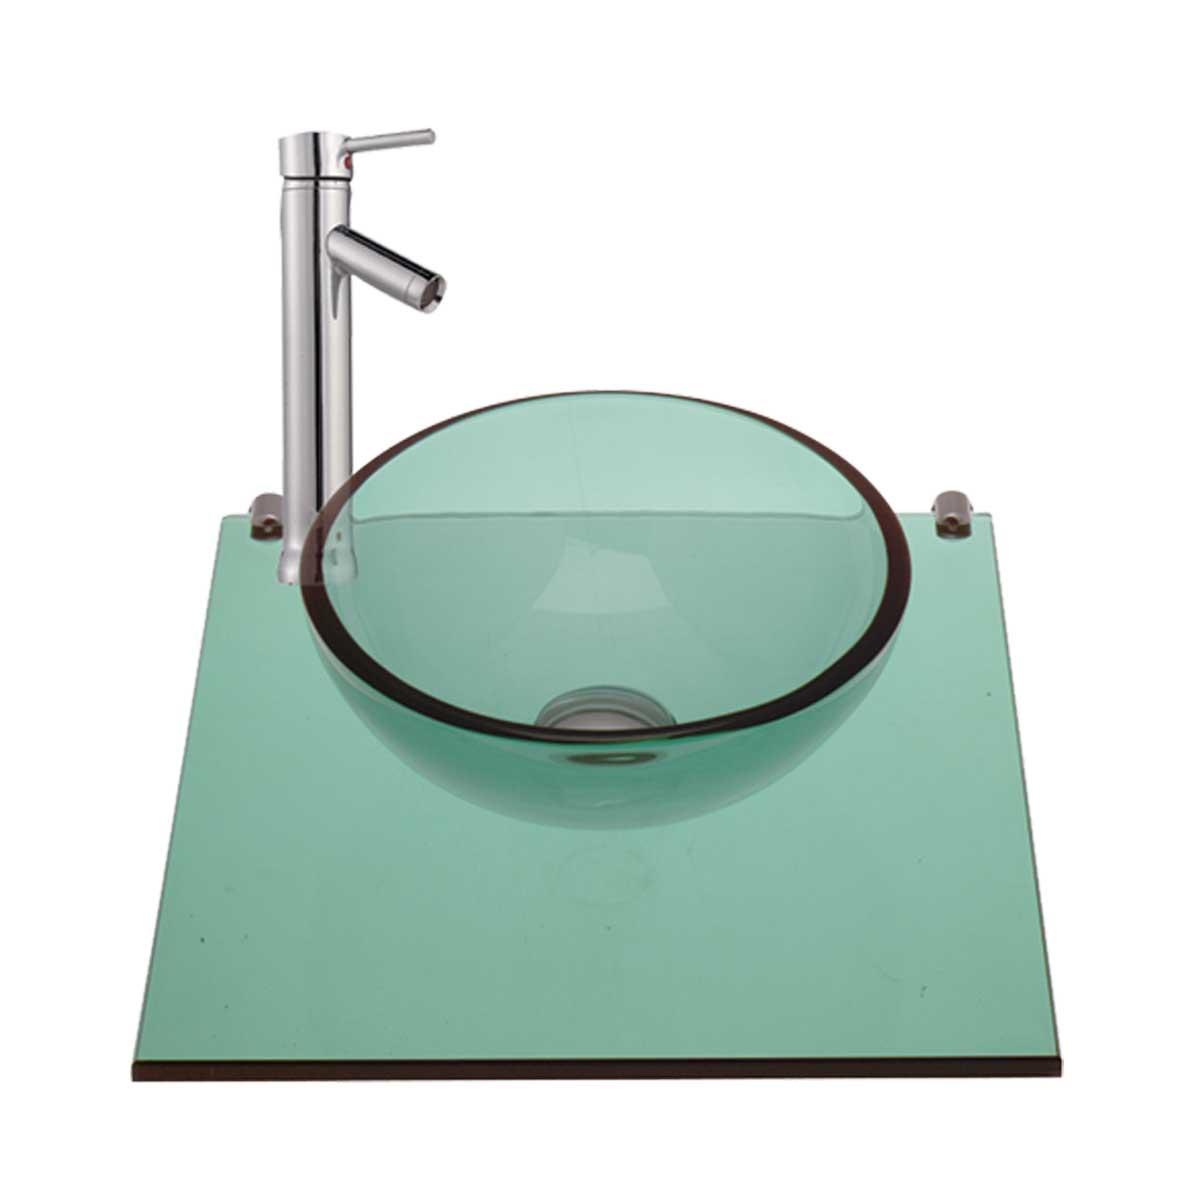 Washing Wall Mount Mini Glass Sink Faucet In